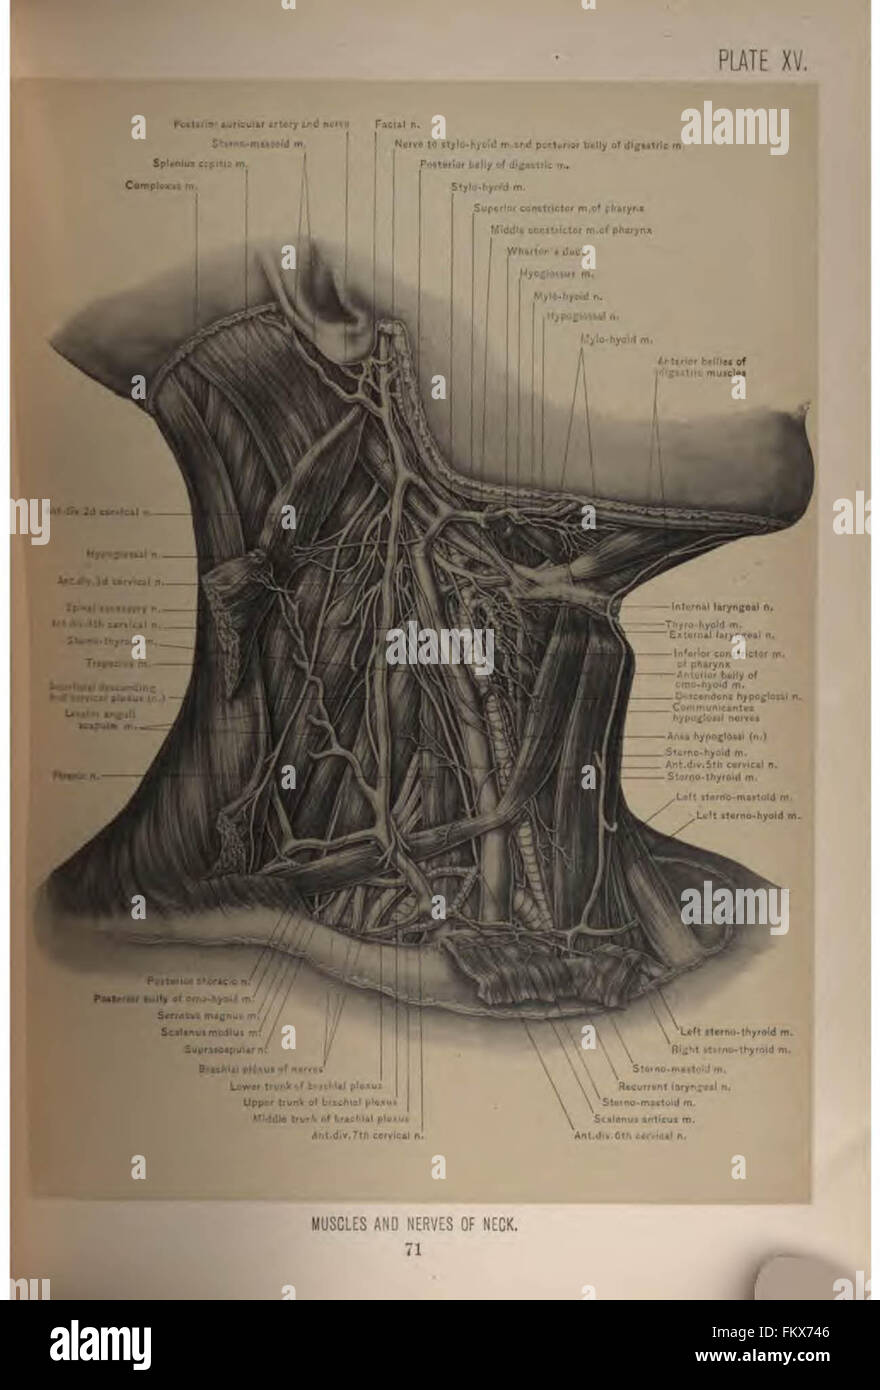 Surgical Anatomy Head Neck Deaver Stock Photos & Surgical Anatomy ...